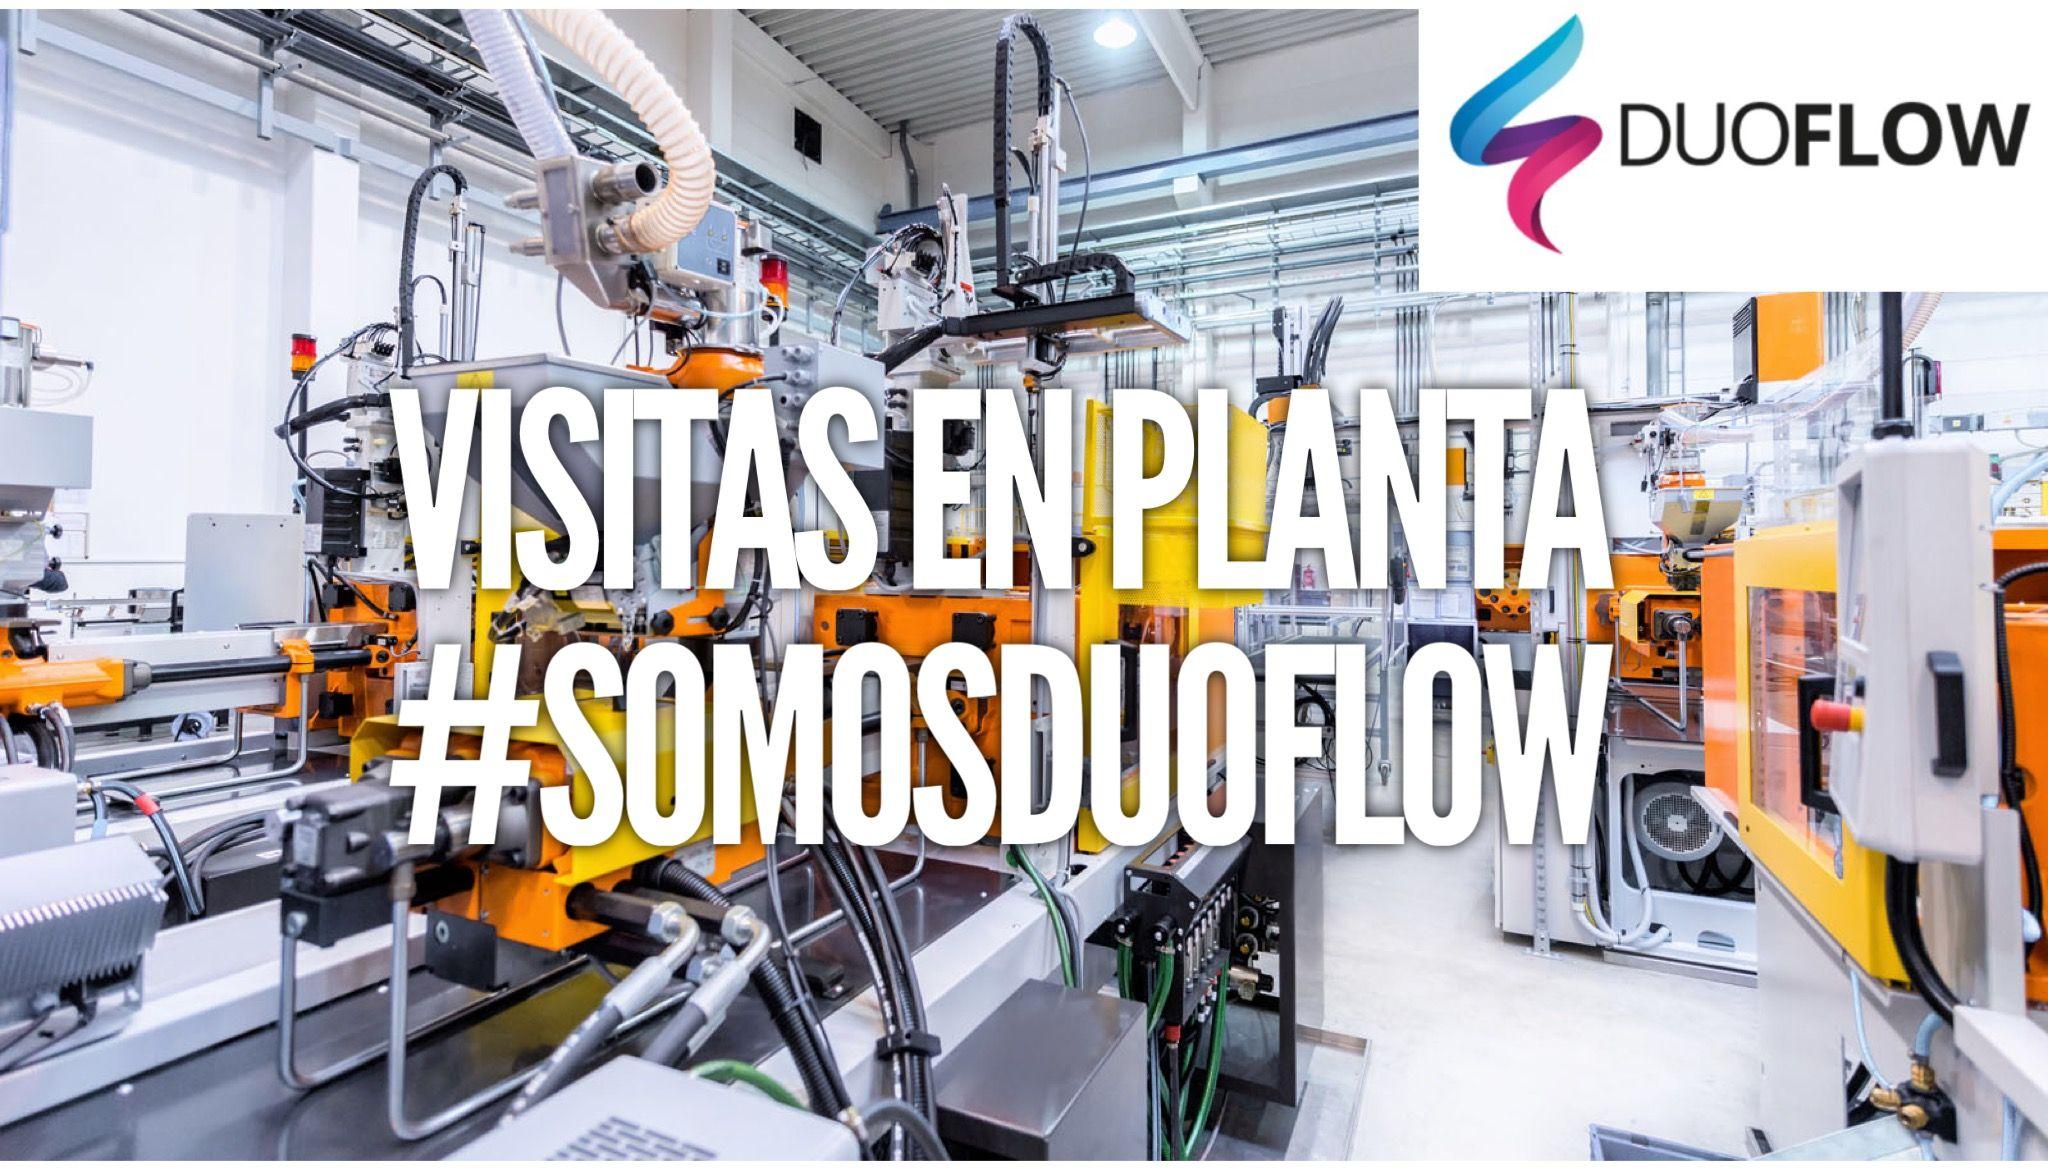 Visitando clientes 🙂#somosduoflow #bombas #valvulas #neumatica #hidraulica #mangueras #compresores #bridas #industria #industriaargentina #duoflow #pilar #agua #fluidos #fluidosindustriales #ksb #camozzi #xylem #flygt #festo #micro #parker #dunlop #bosch #argentina